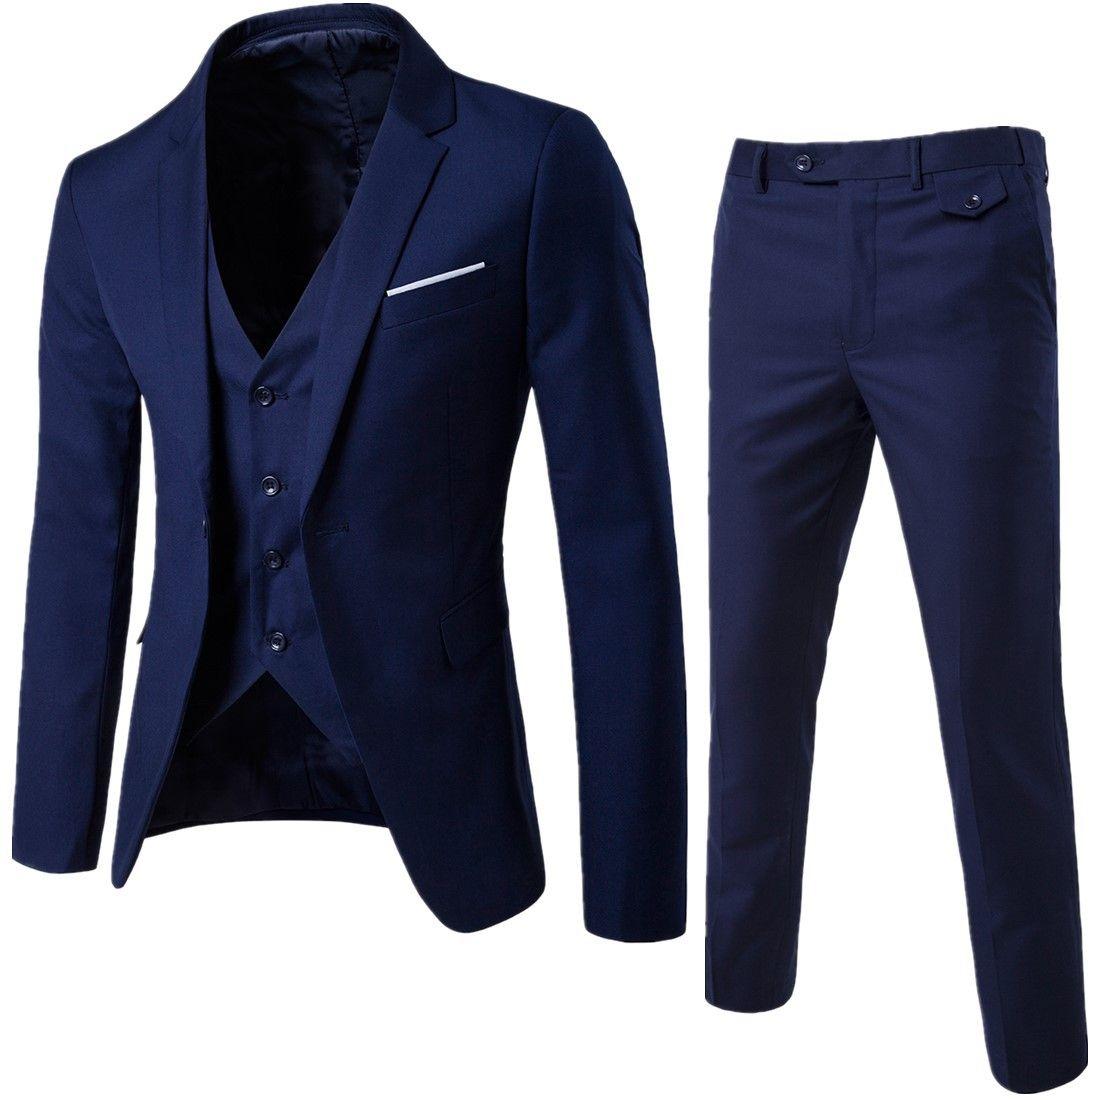 2018 Designer Men Suit Groom Tuxedos Groomsmen Side Vent Slim Fit